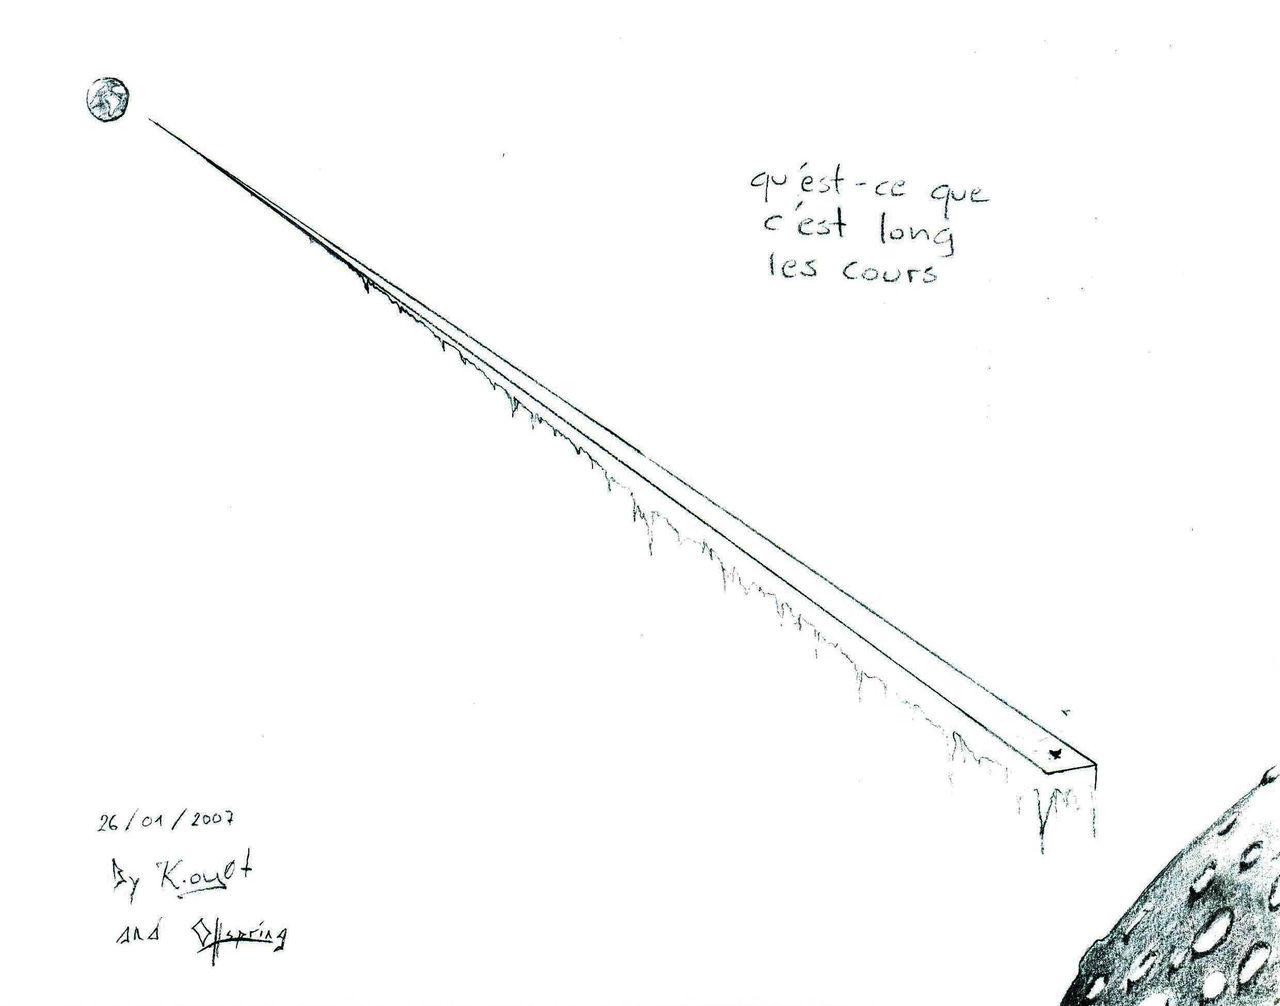 Philippe Schmucker Lixow by Koyot & Offspring